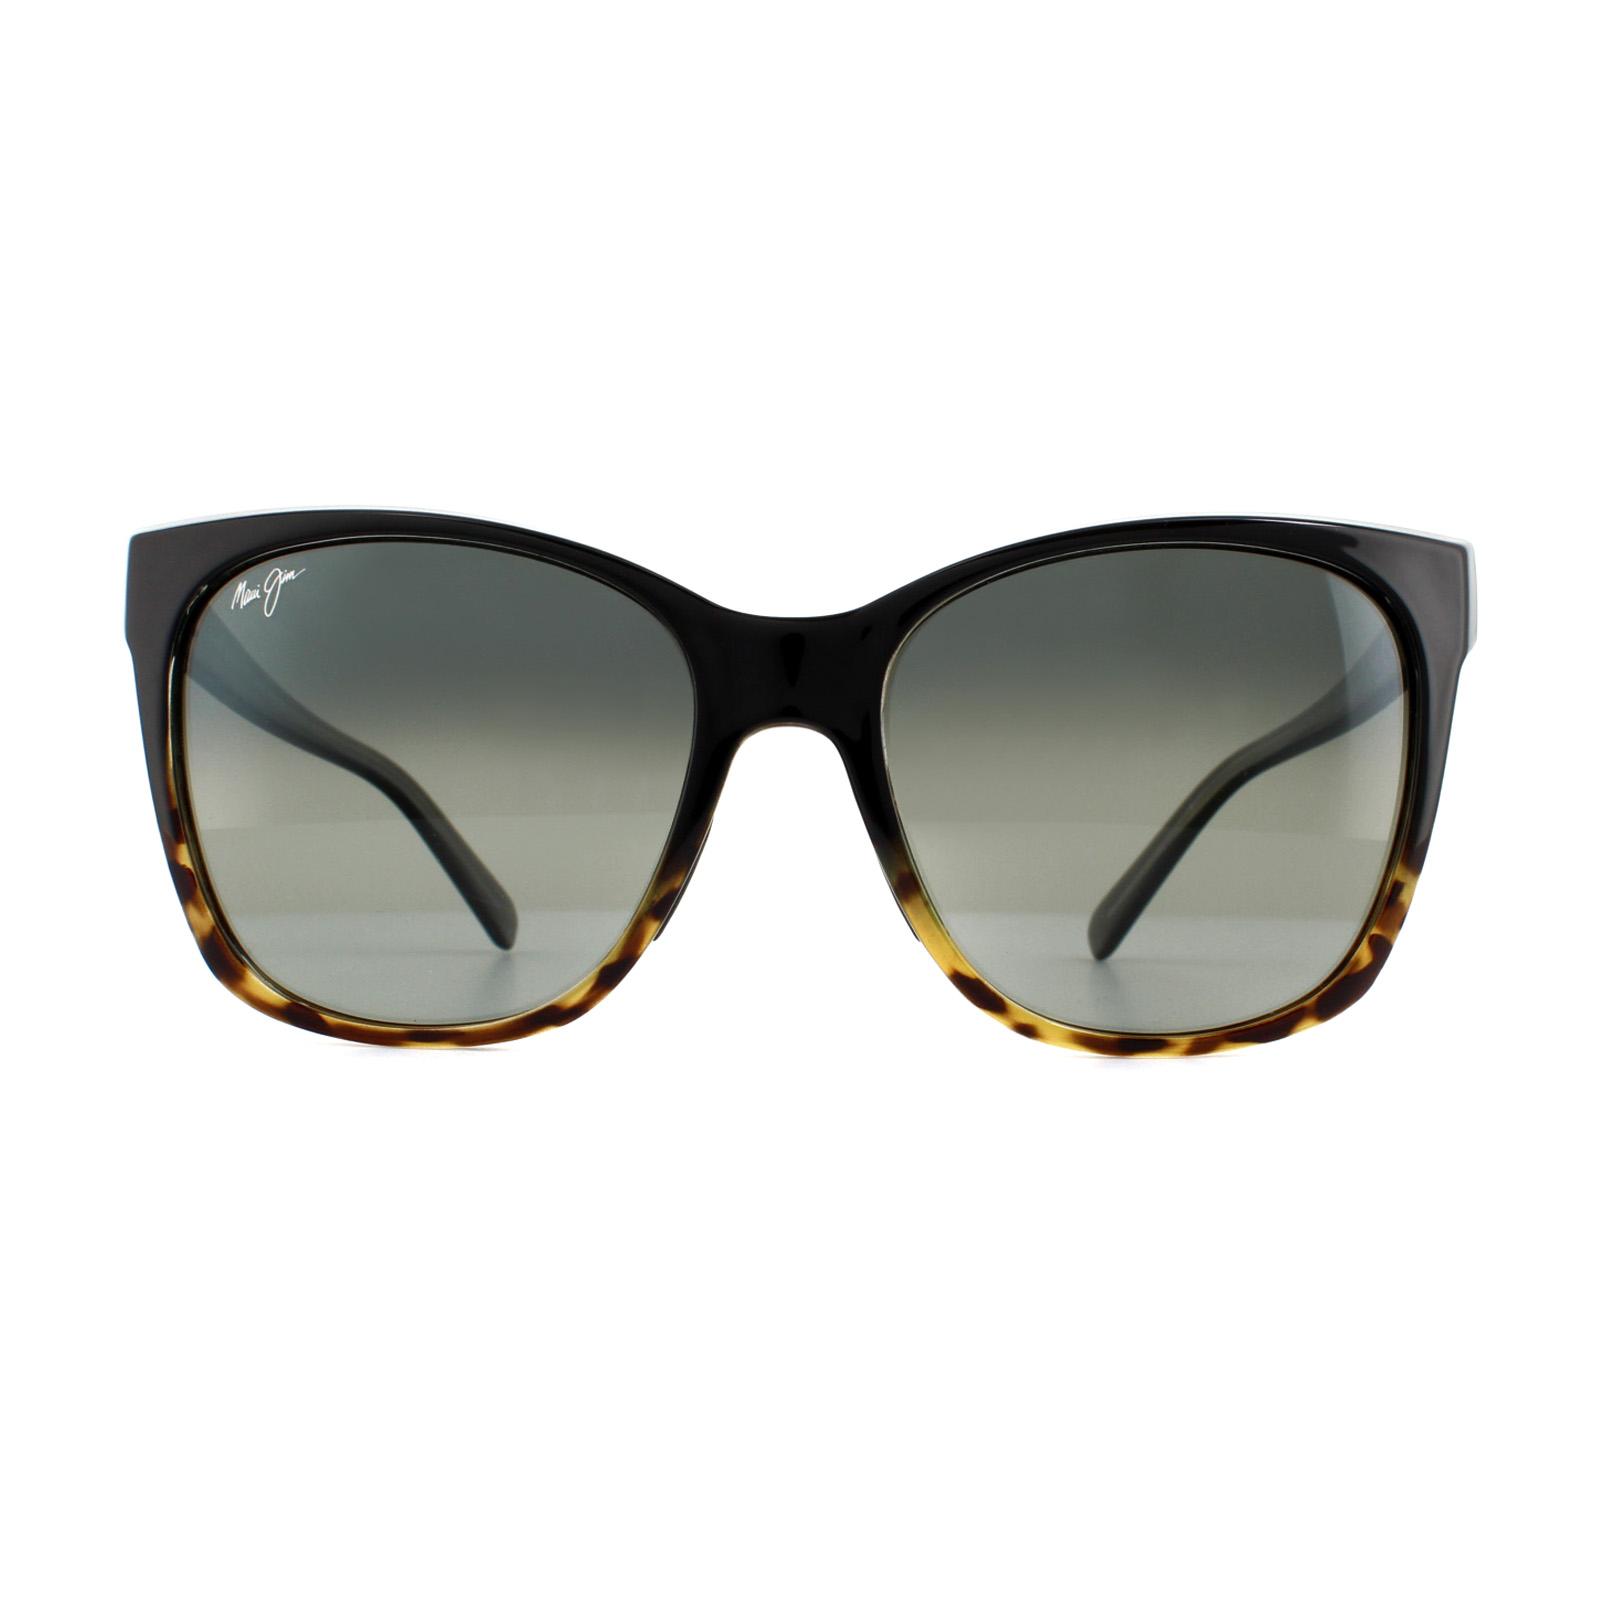 3f1438324a Maui Jim Alekona Sunglasses Thumbnail 1 Maui Jim Alekona Sunglasses  Thumbnail 2 ...